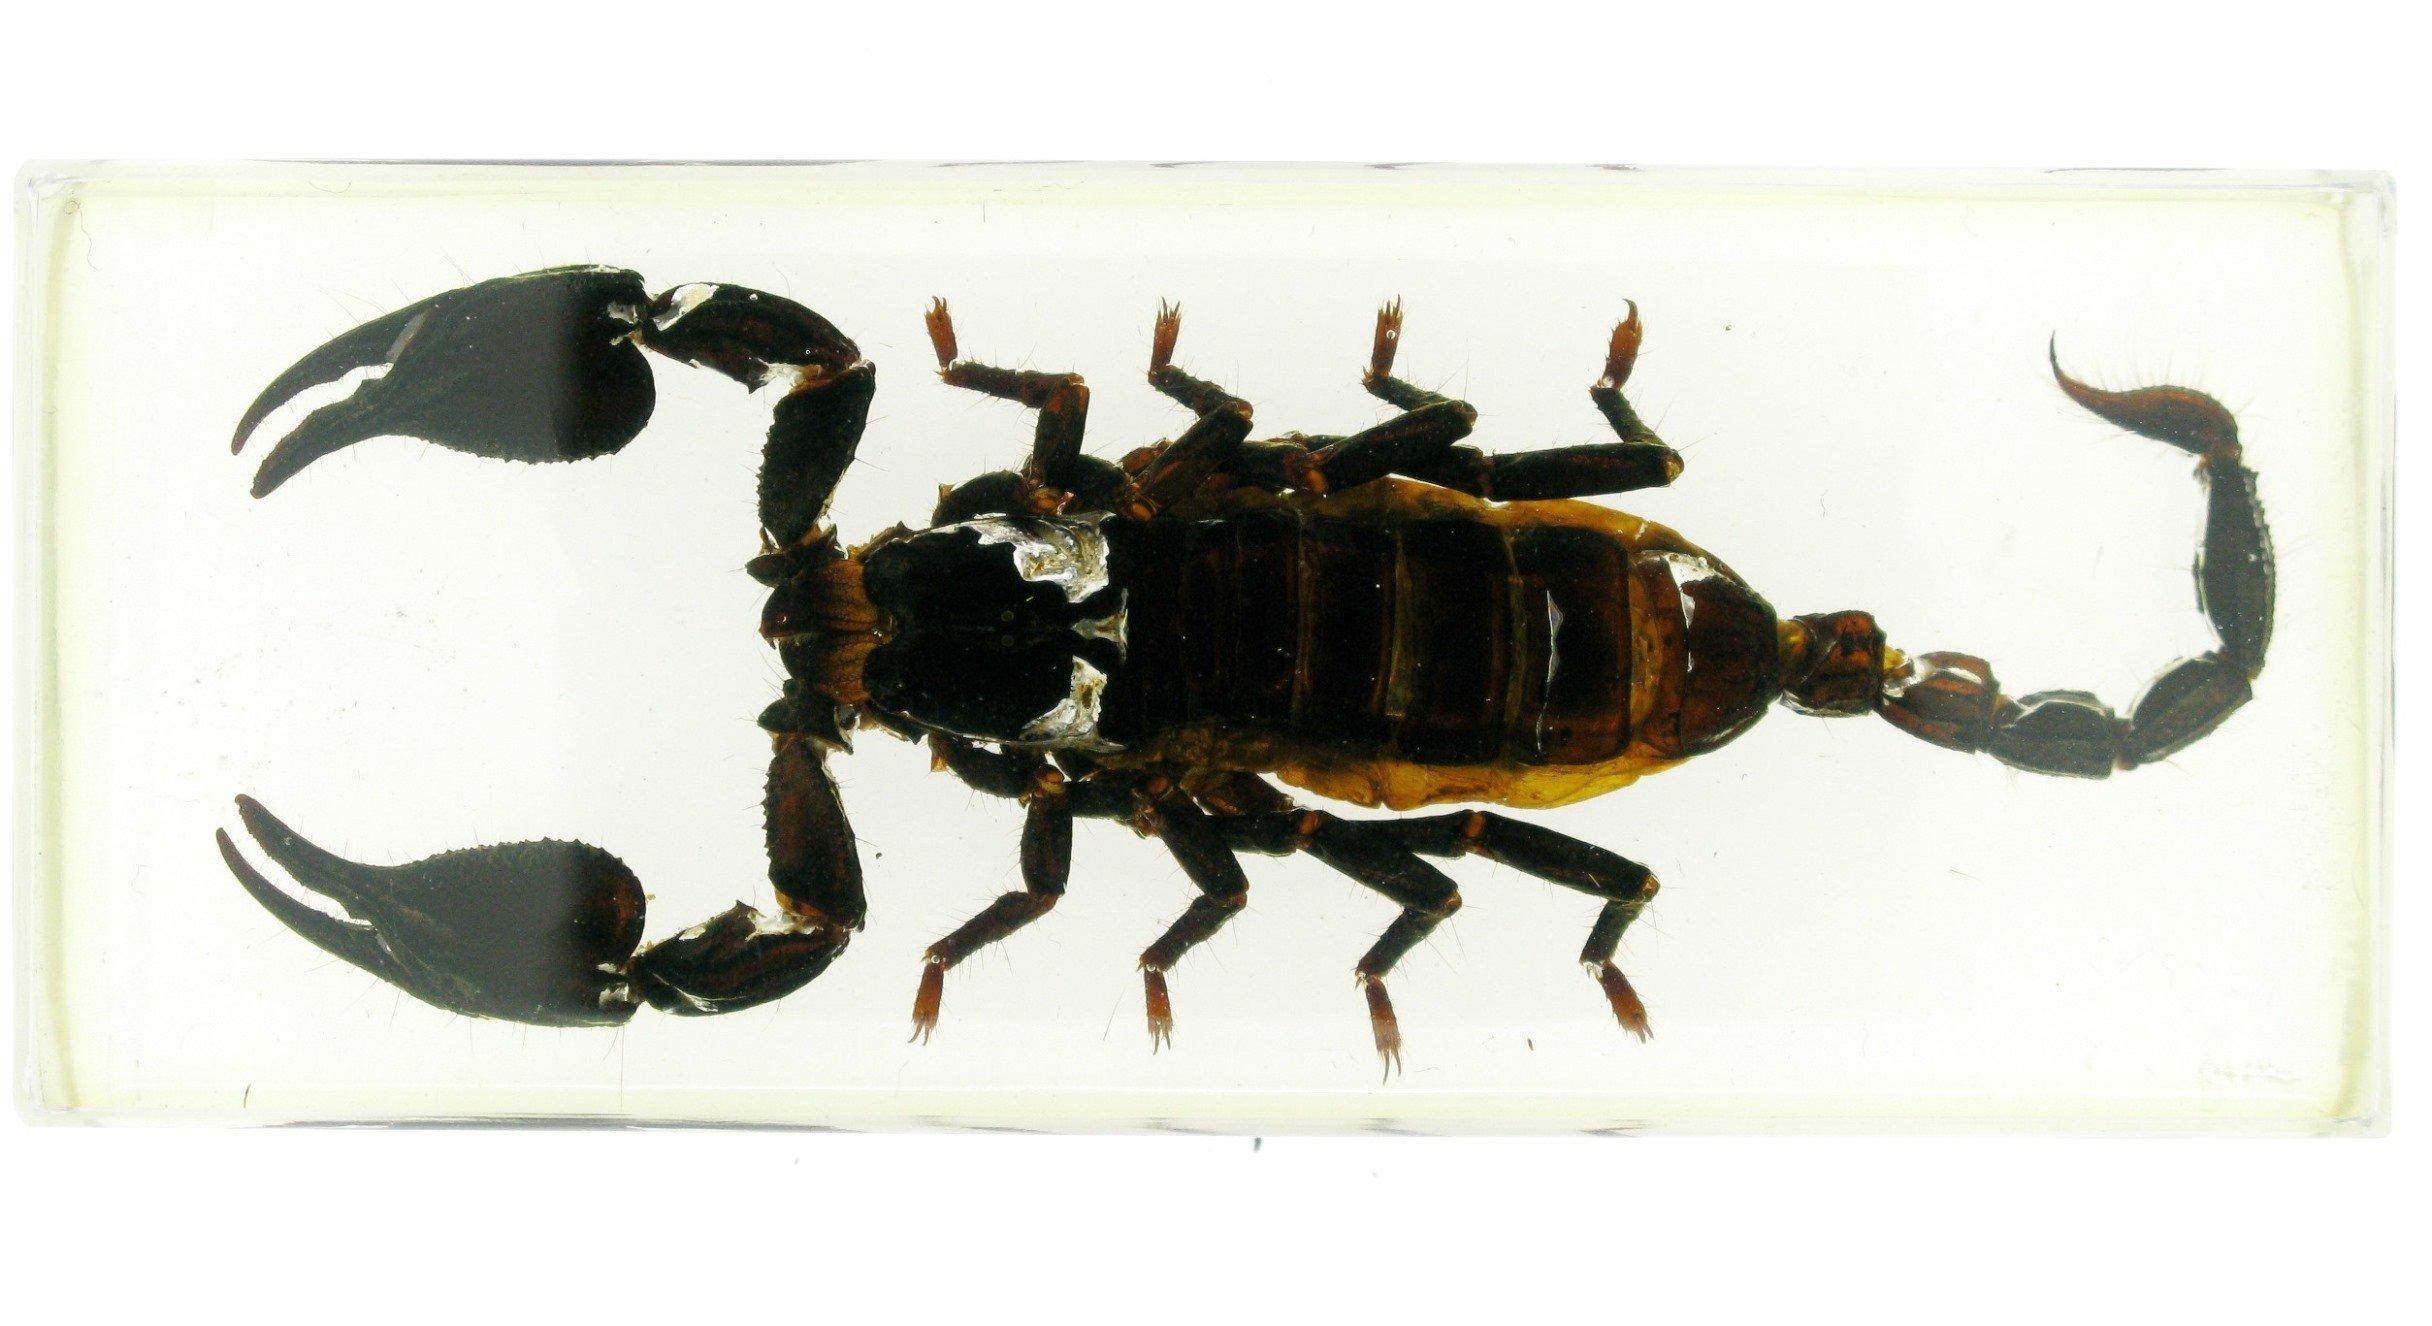 Black Scorpion in Acrylic BK3